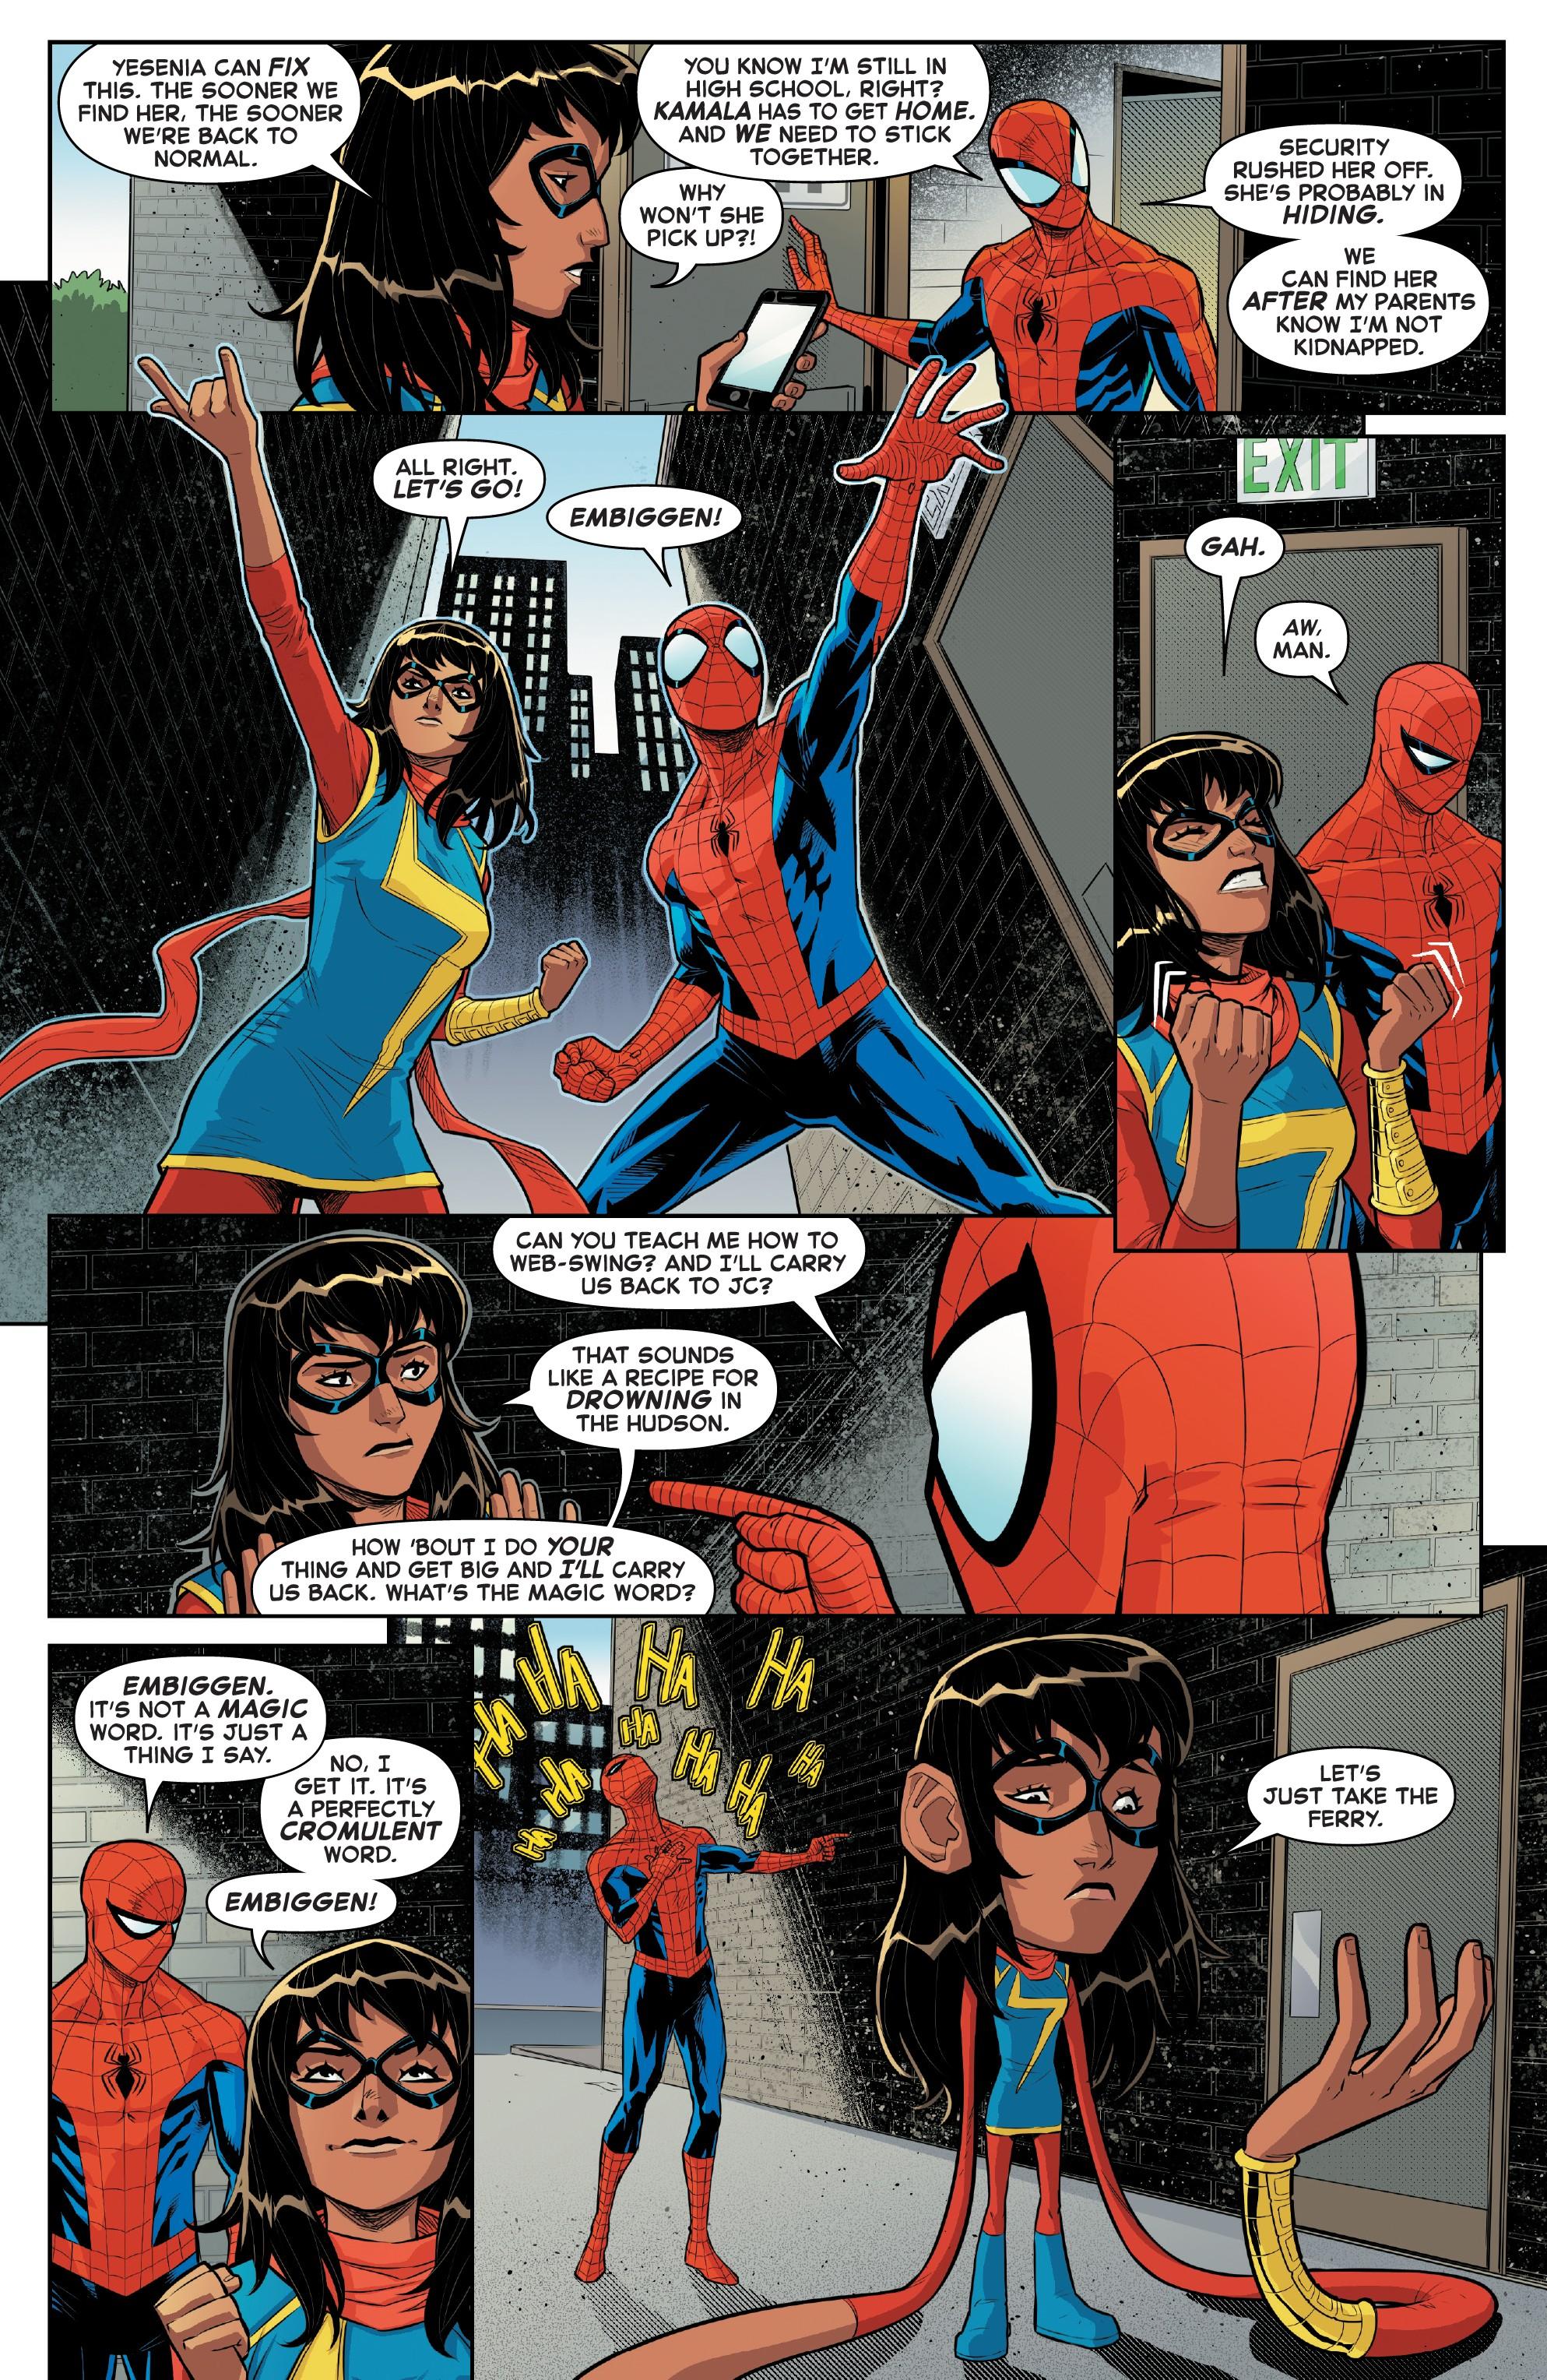 Marvel Team-Up(2019-): Chapter 2 - Page Marvel Team-Up(2019-)